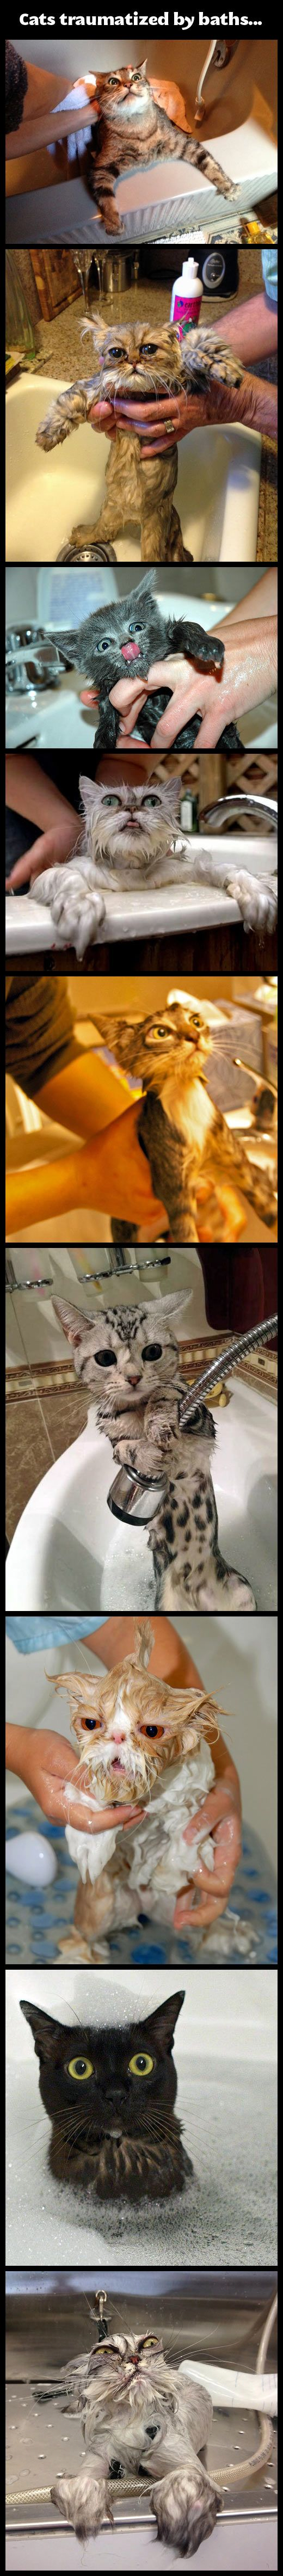 Cats traumatized by baths.